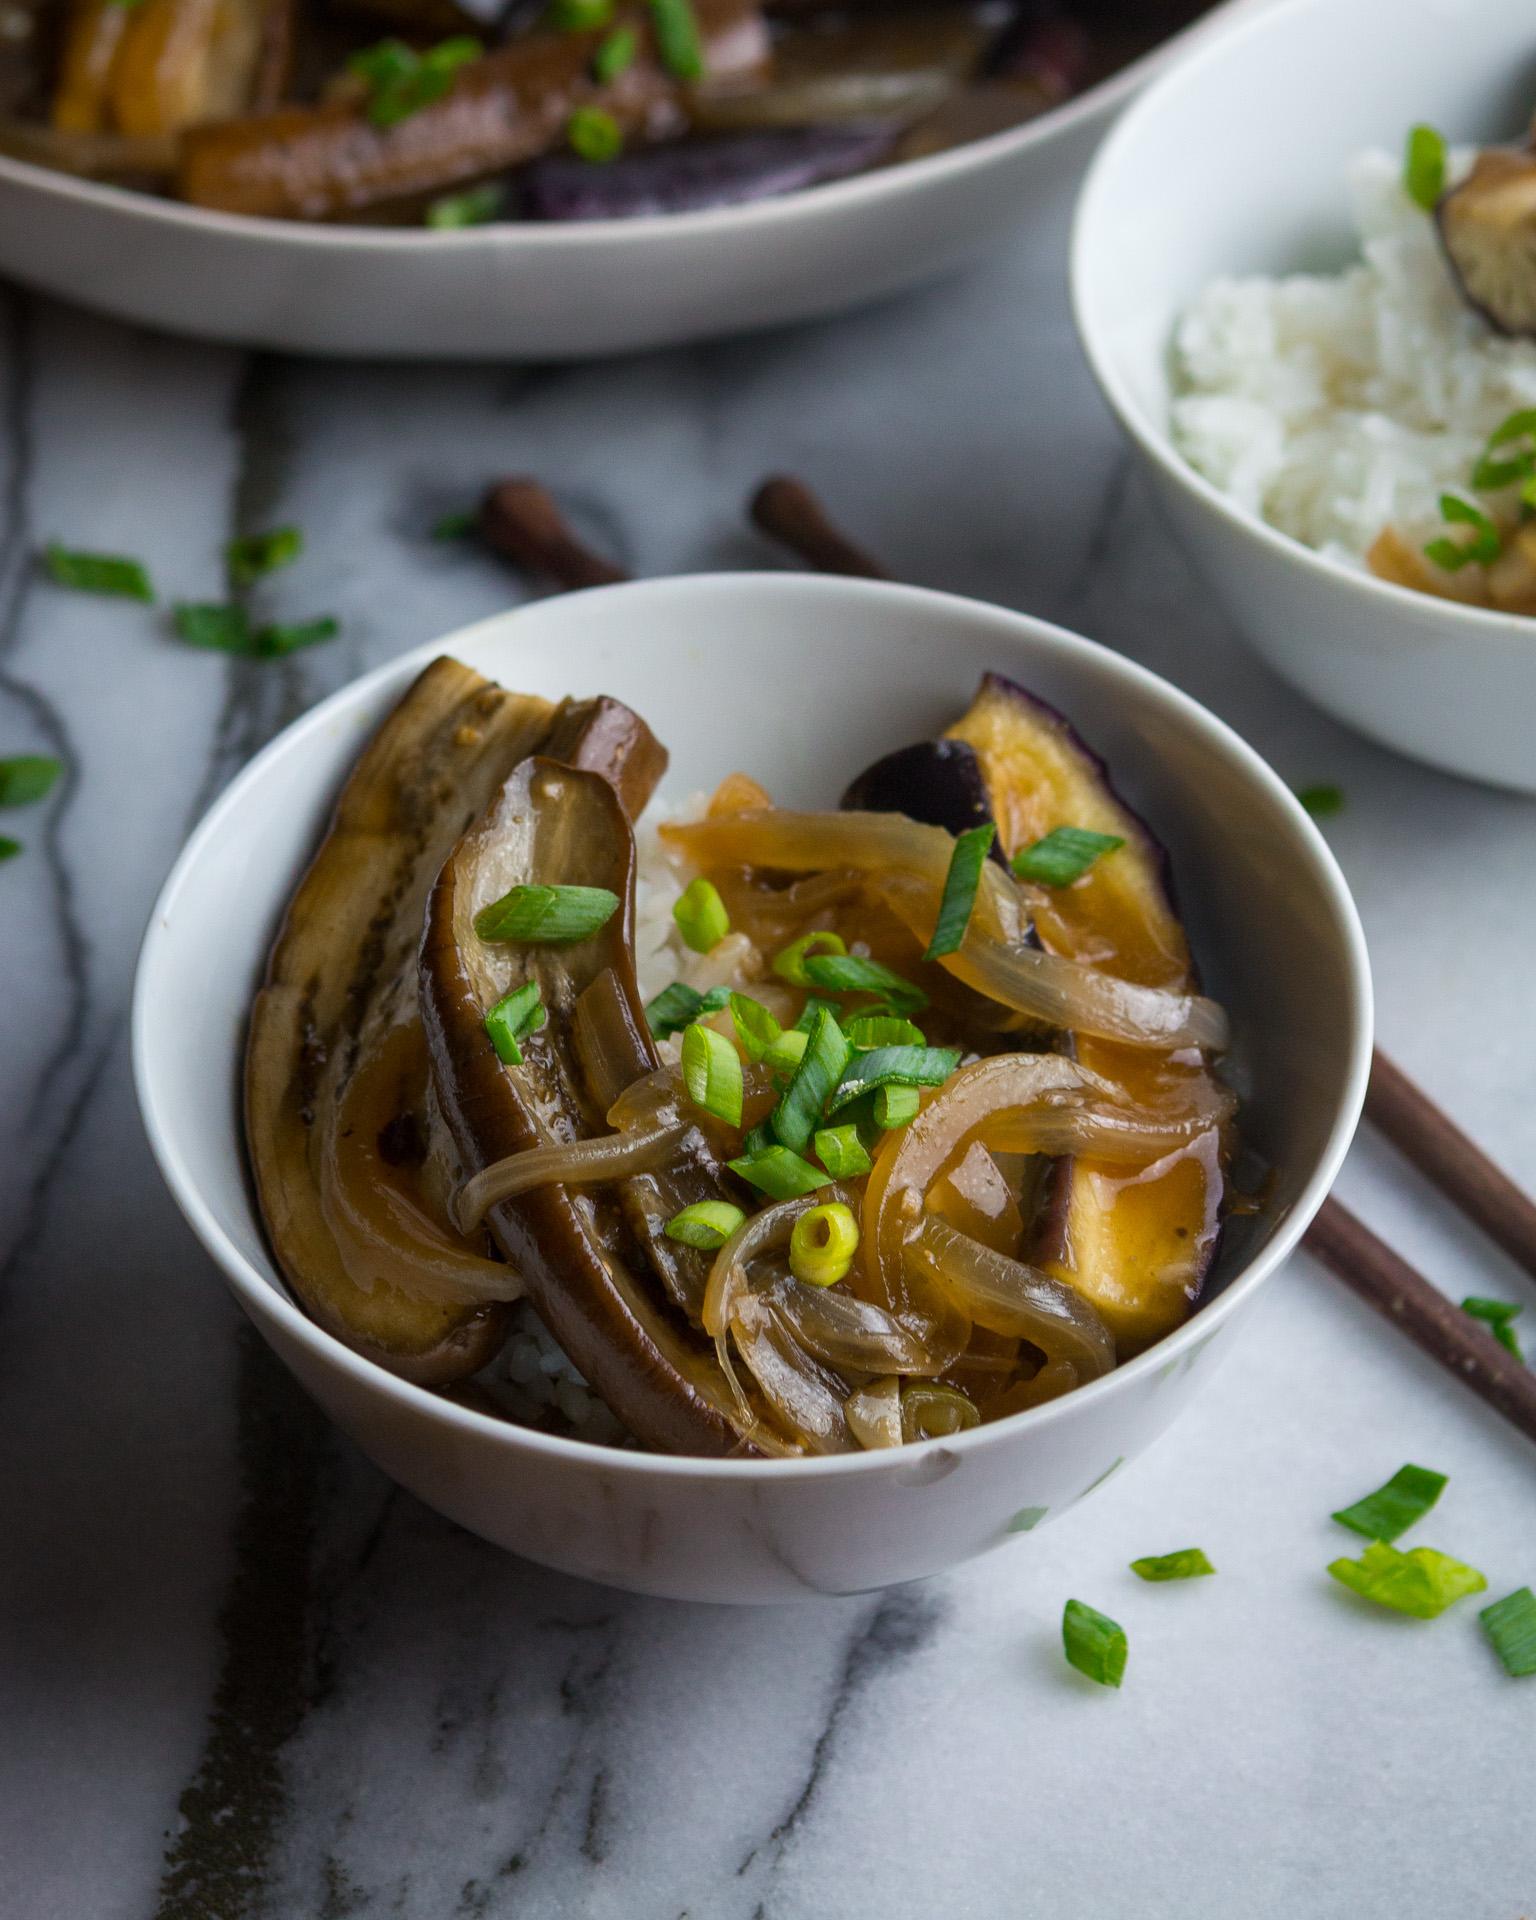 chinese-style-eggplant-6.jpg